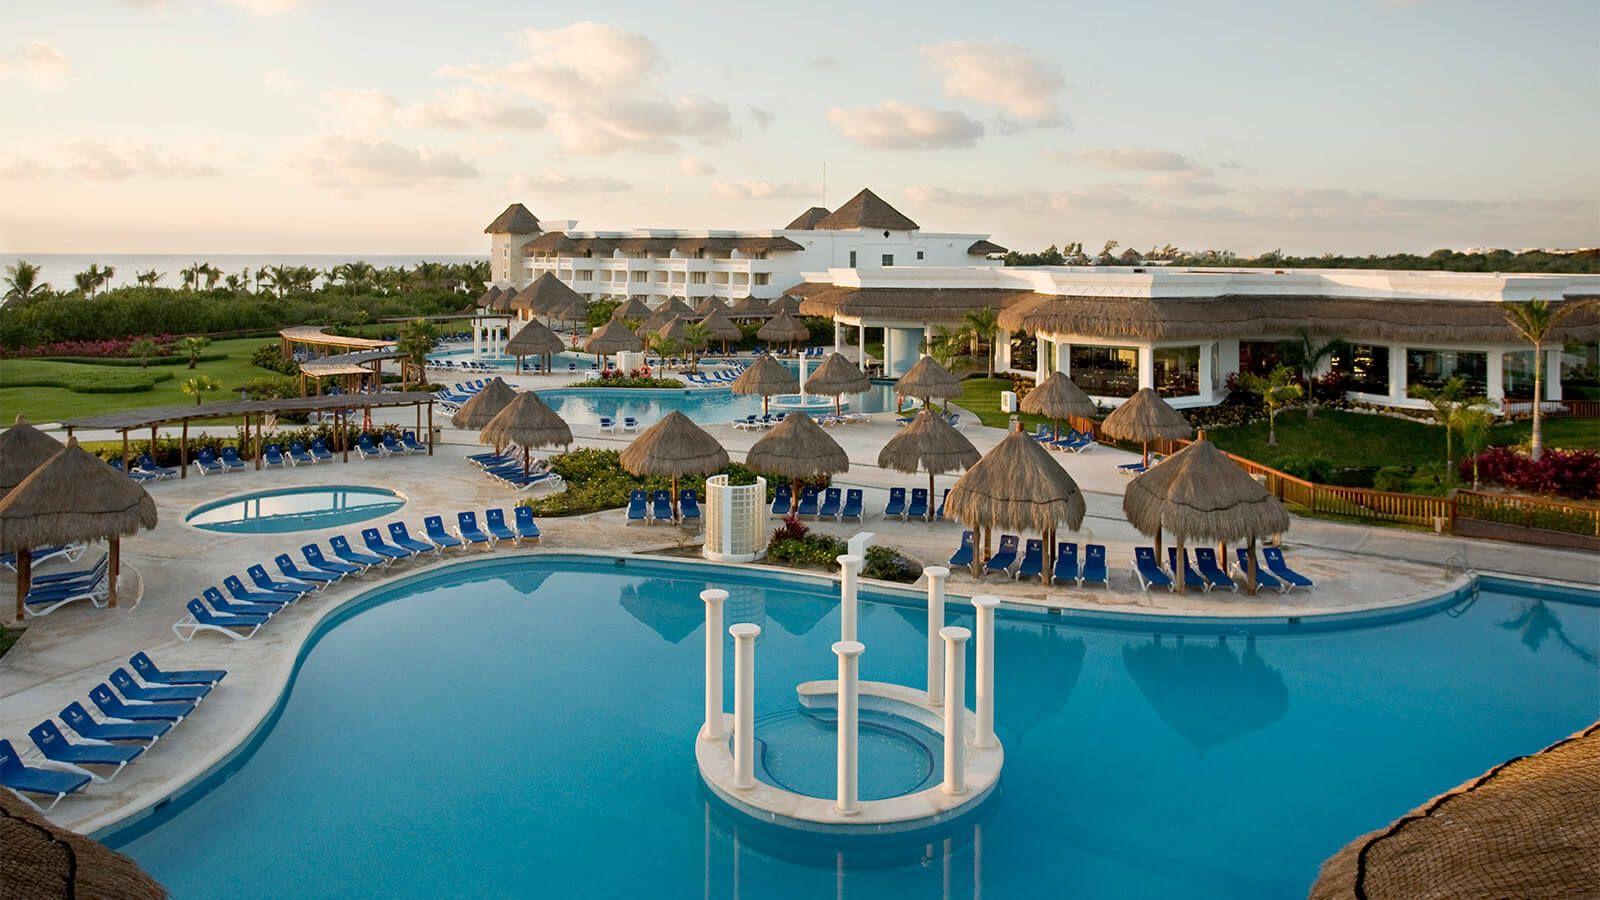 Revelion 2022 - Sejur cu familia plaja Grand Riviera Princess 5*, Mexic, 9 zile